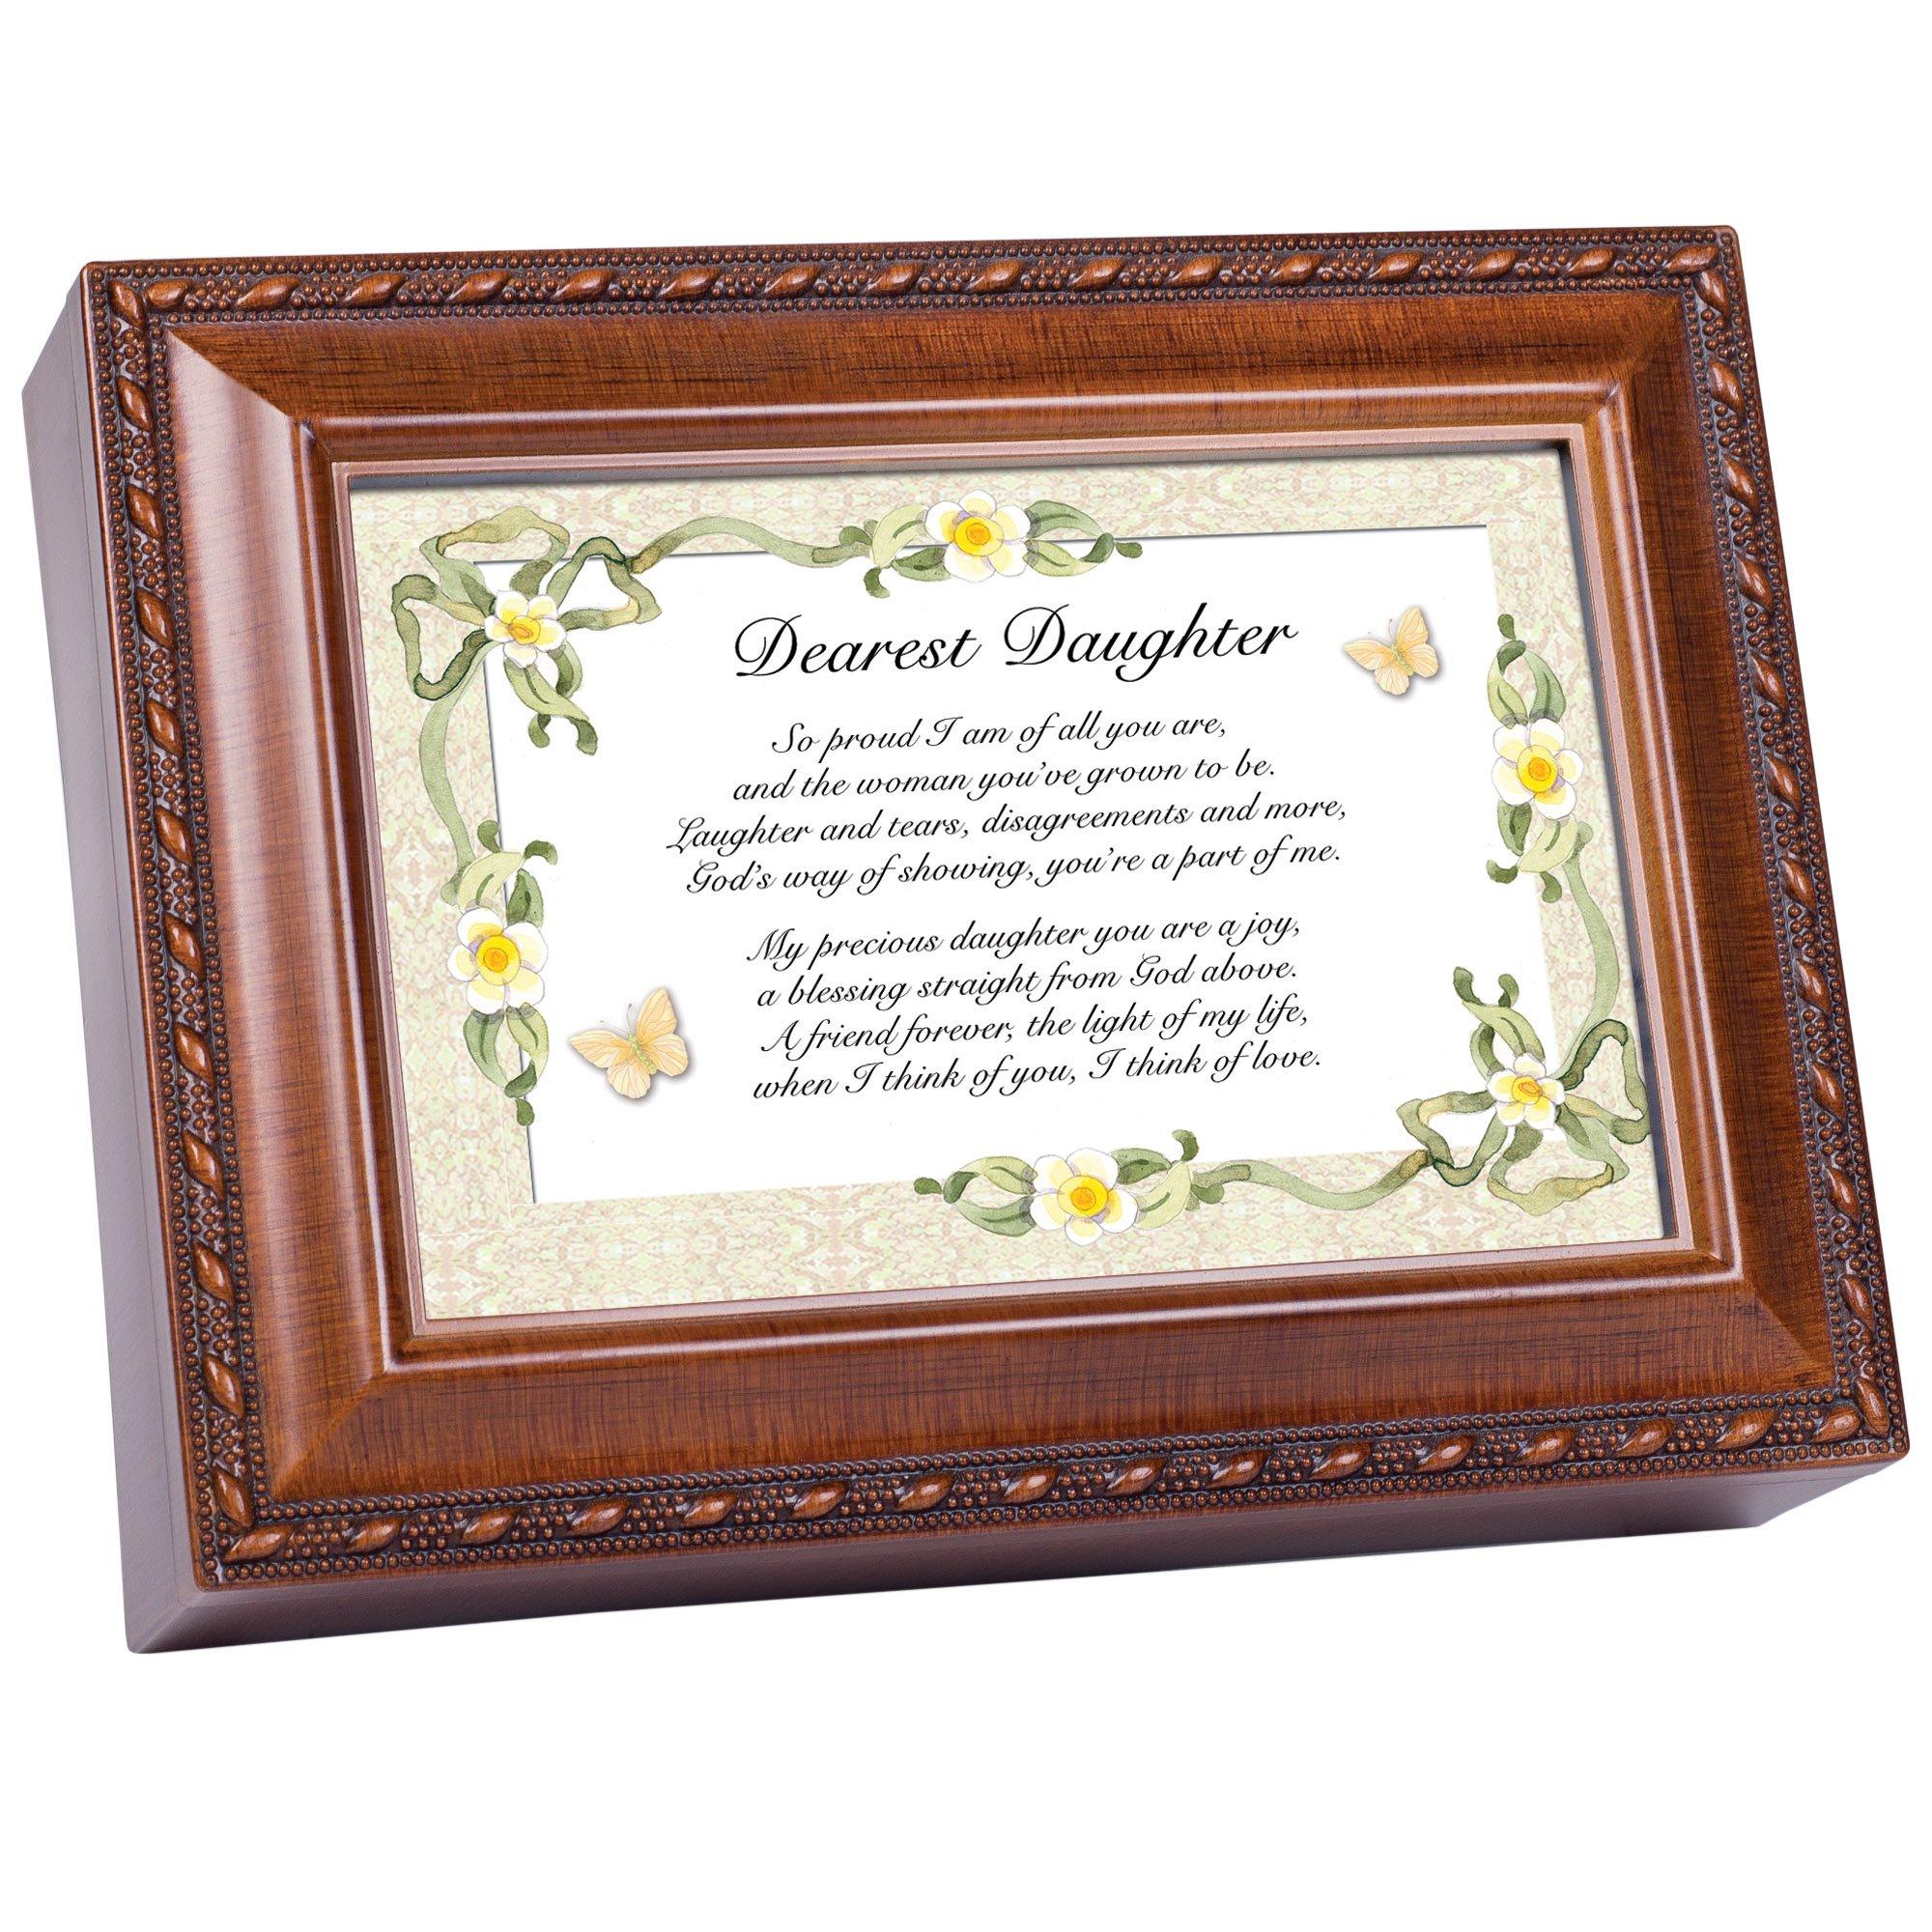 Cottage Garden Dearest Daughter Woodgrain Music Box Plays Light Up My Life by Cottage Garden (Image #1)